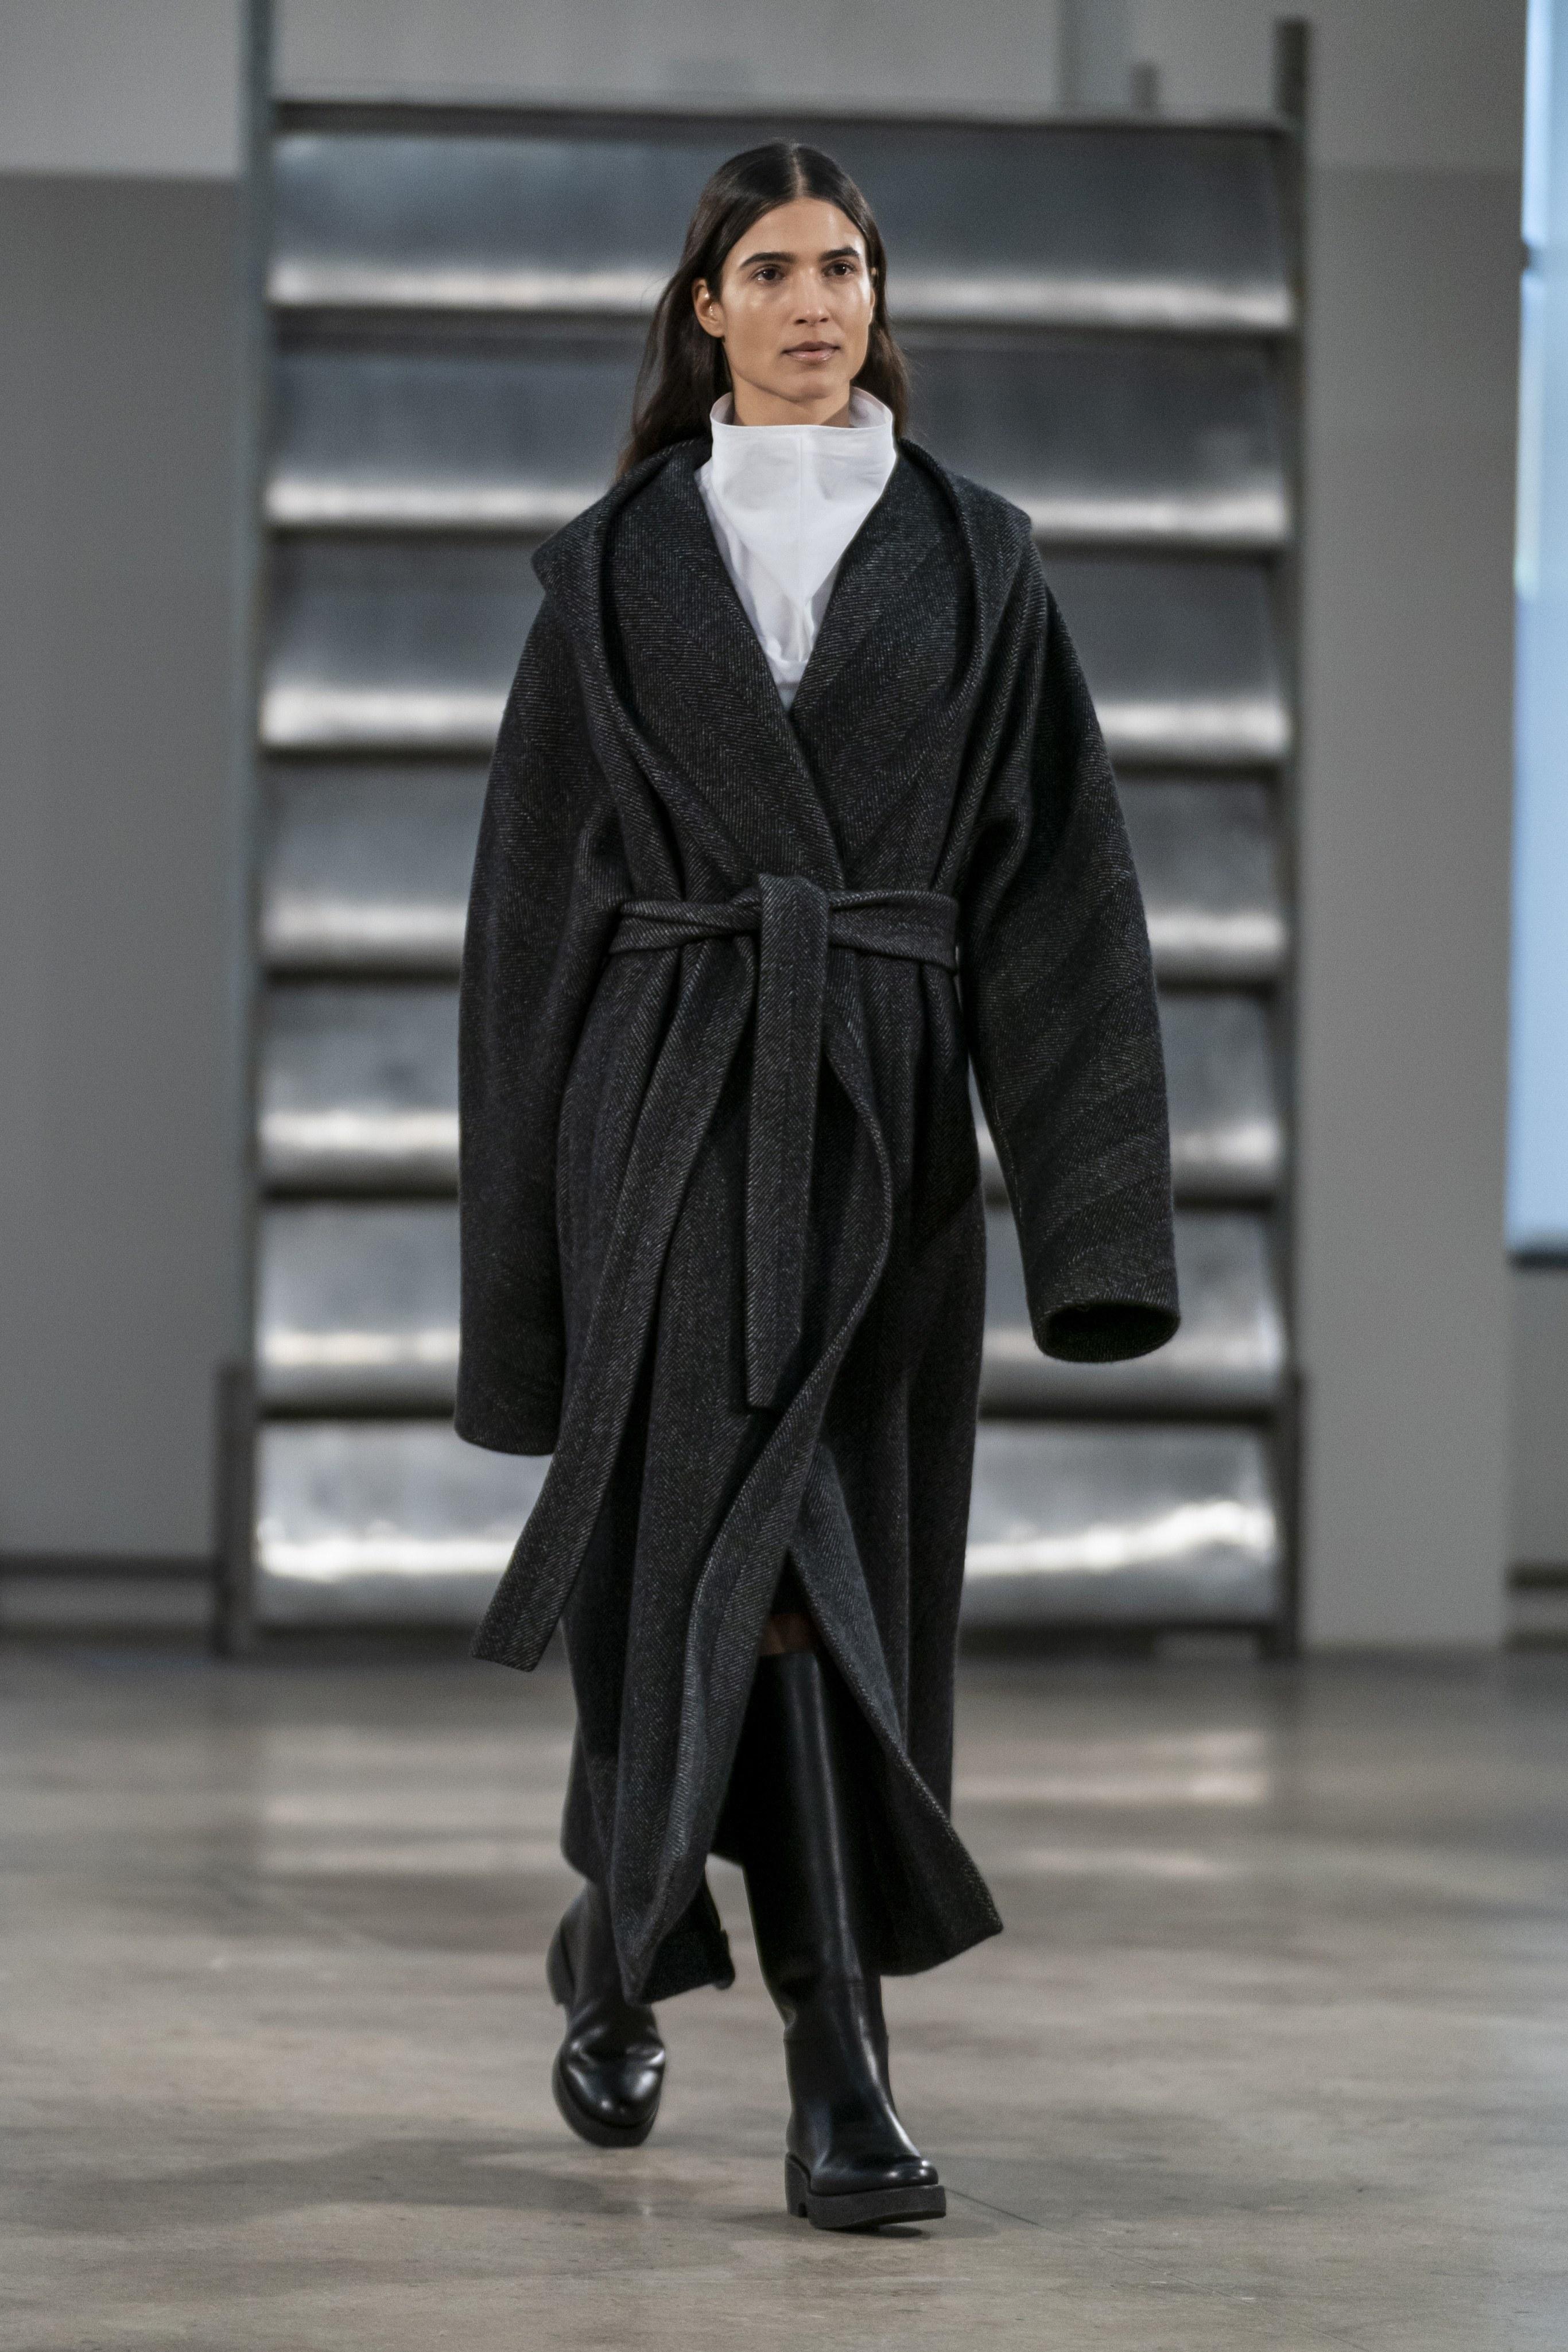 00013-The-Row-Fall-2019-ready-to-wear